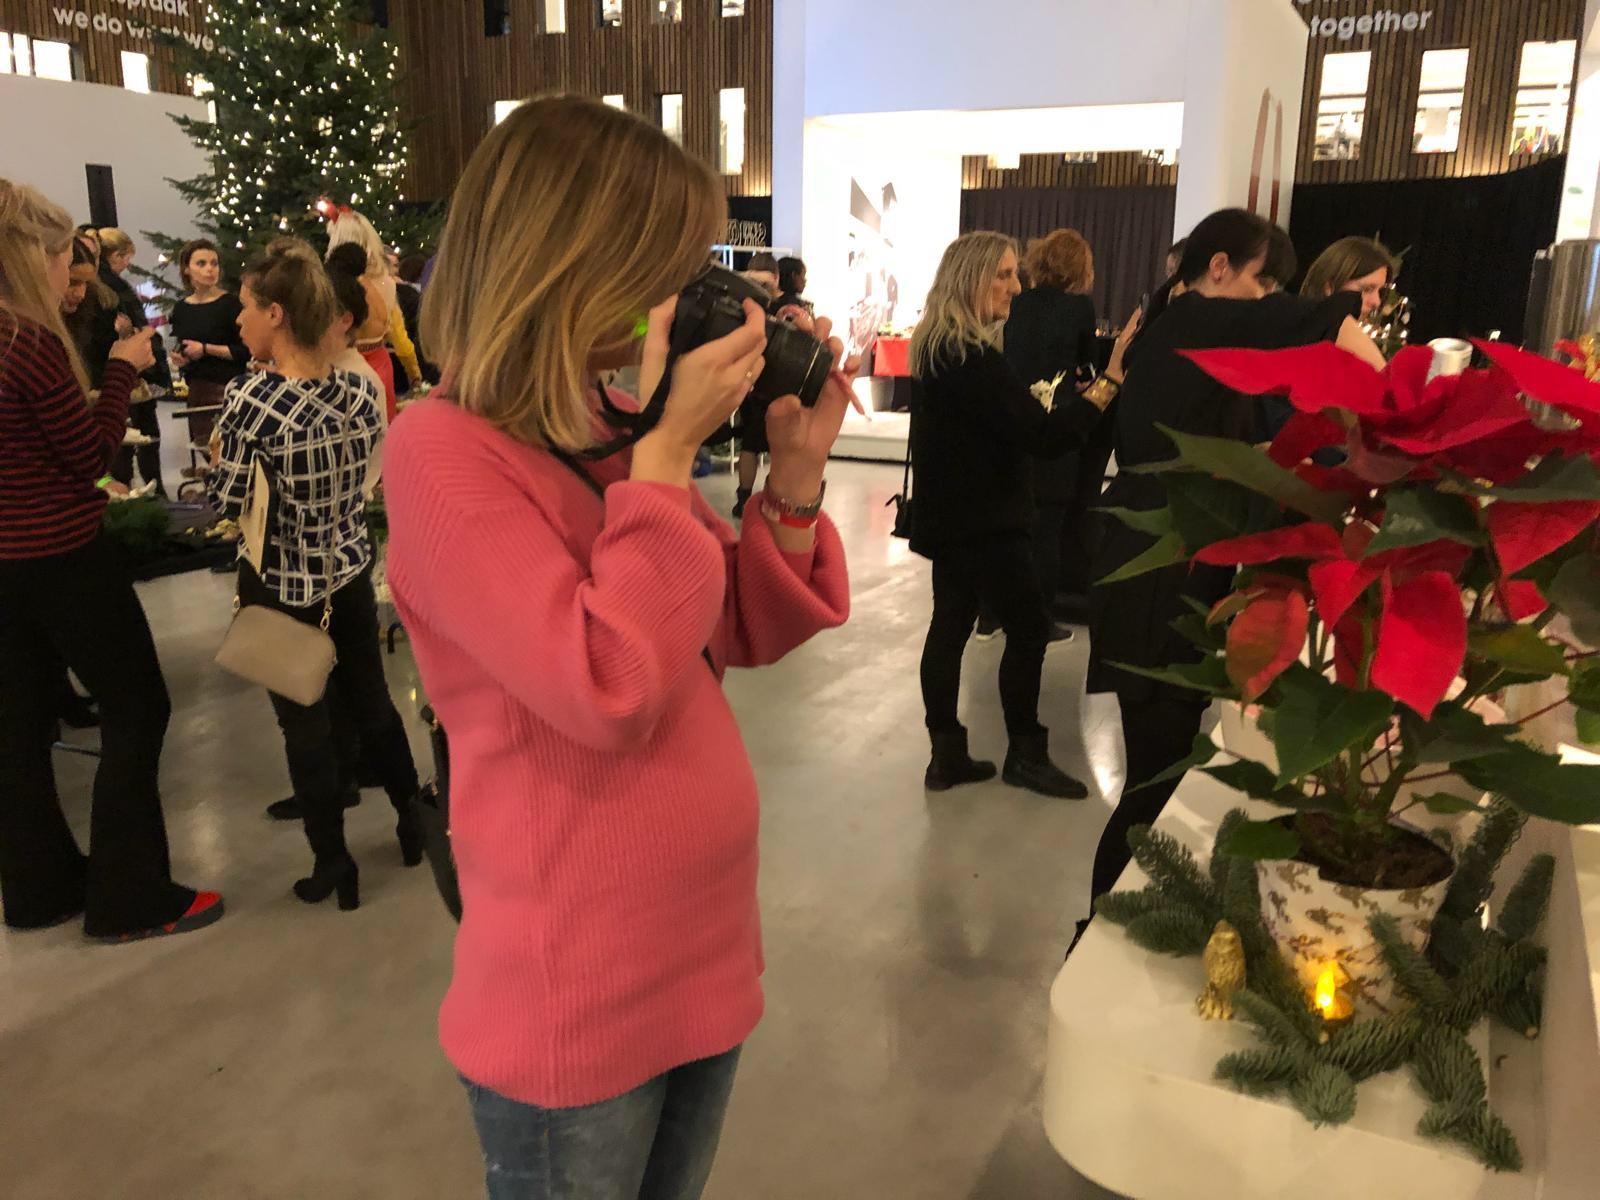 IMG 1534 - Elise's Weekly Pictorama December #2 2017 - Events & Winter Wonderland!